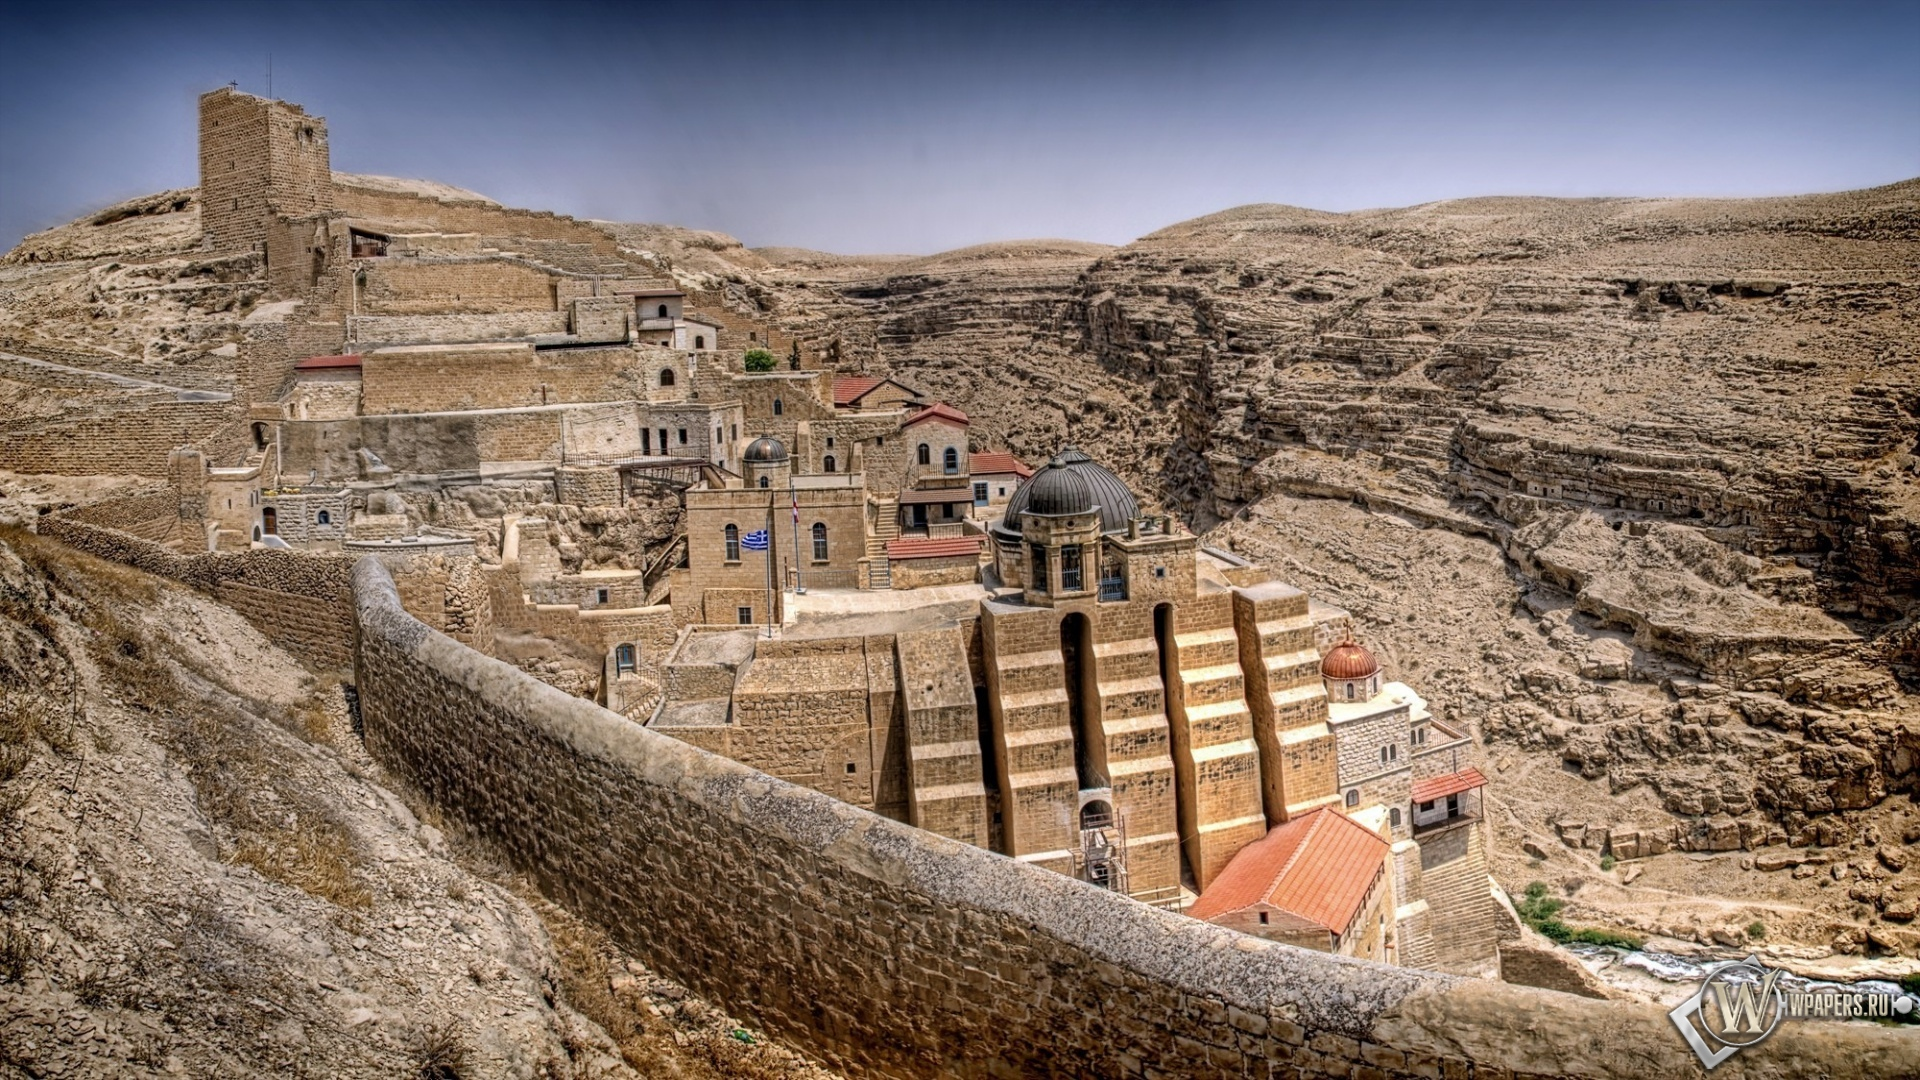 Bethlehem - Israel 1920x1080